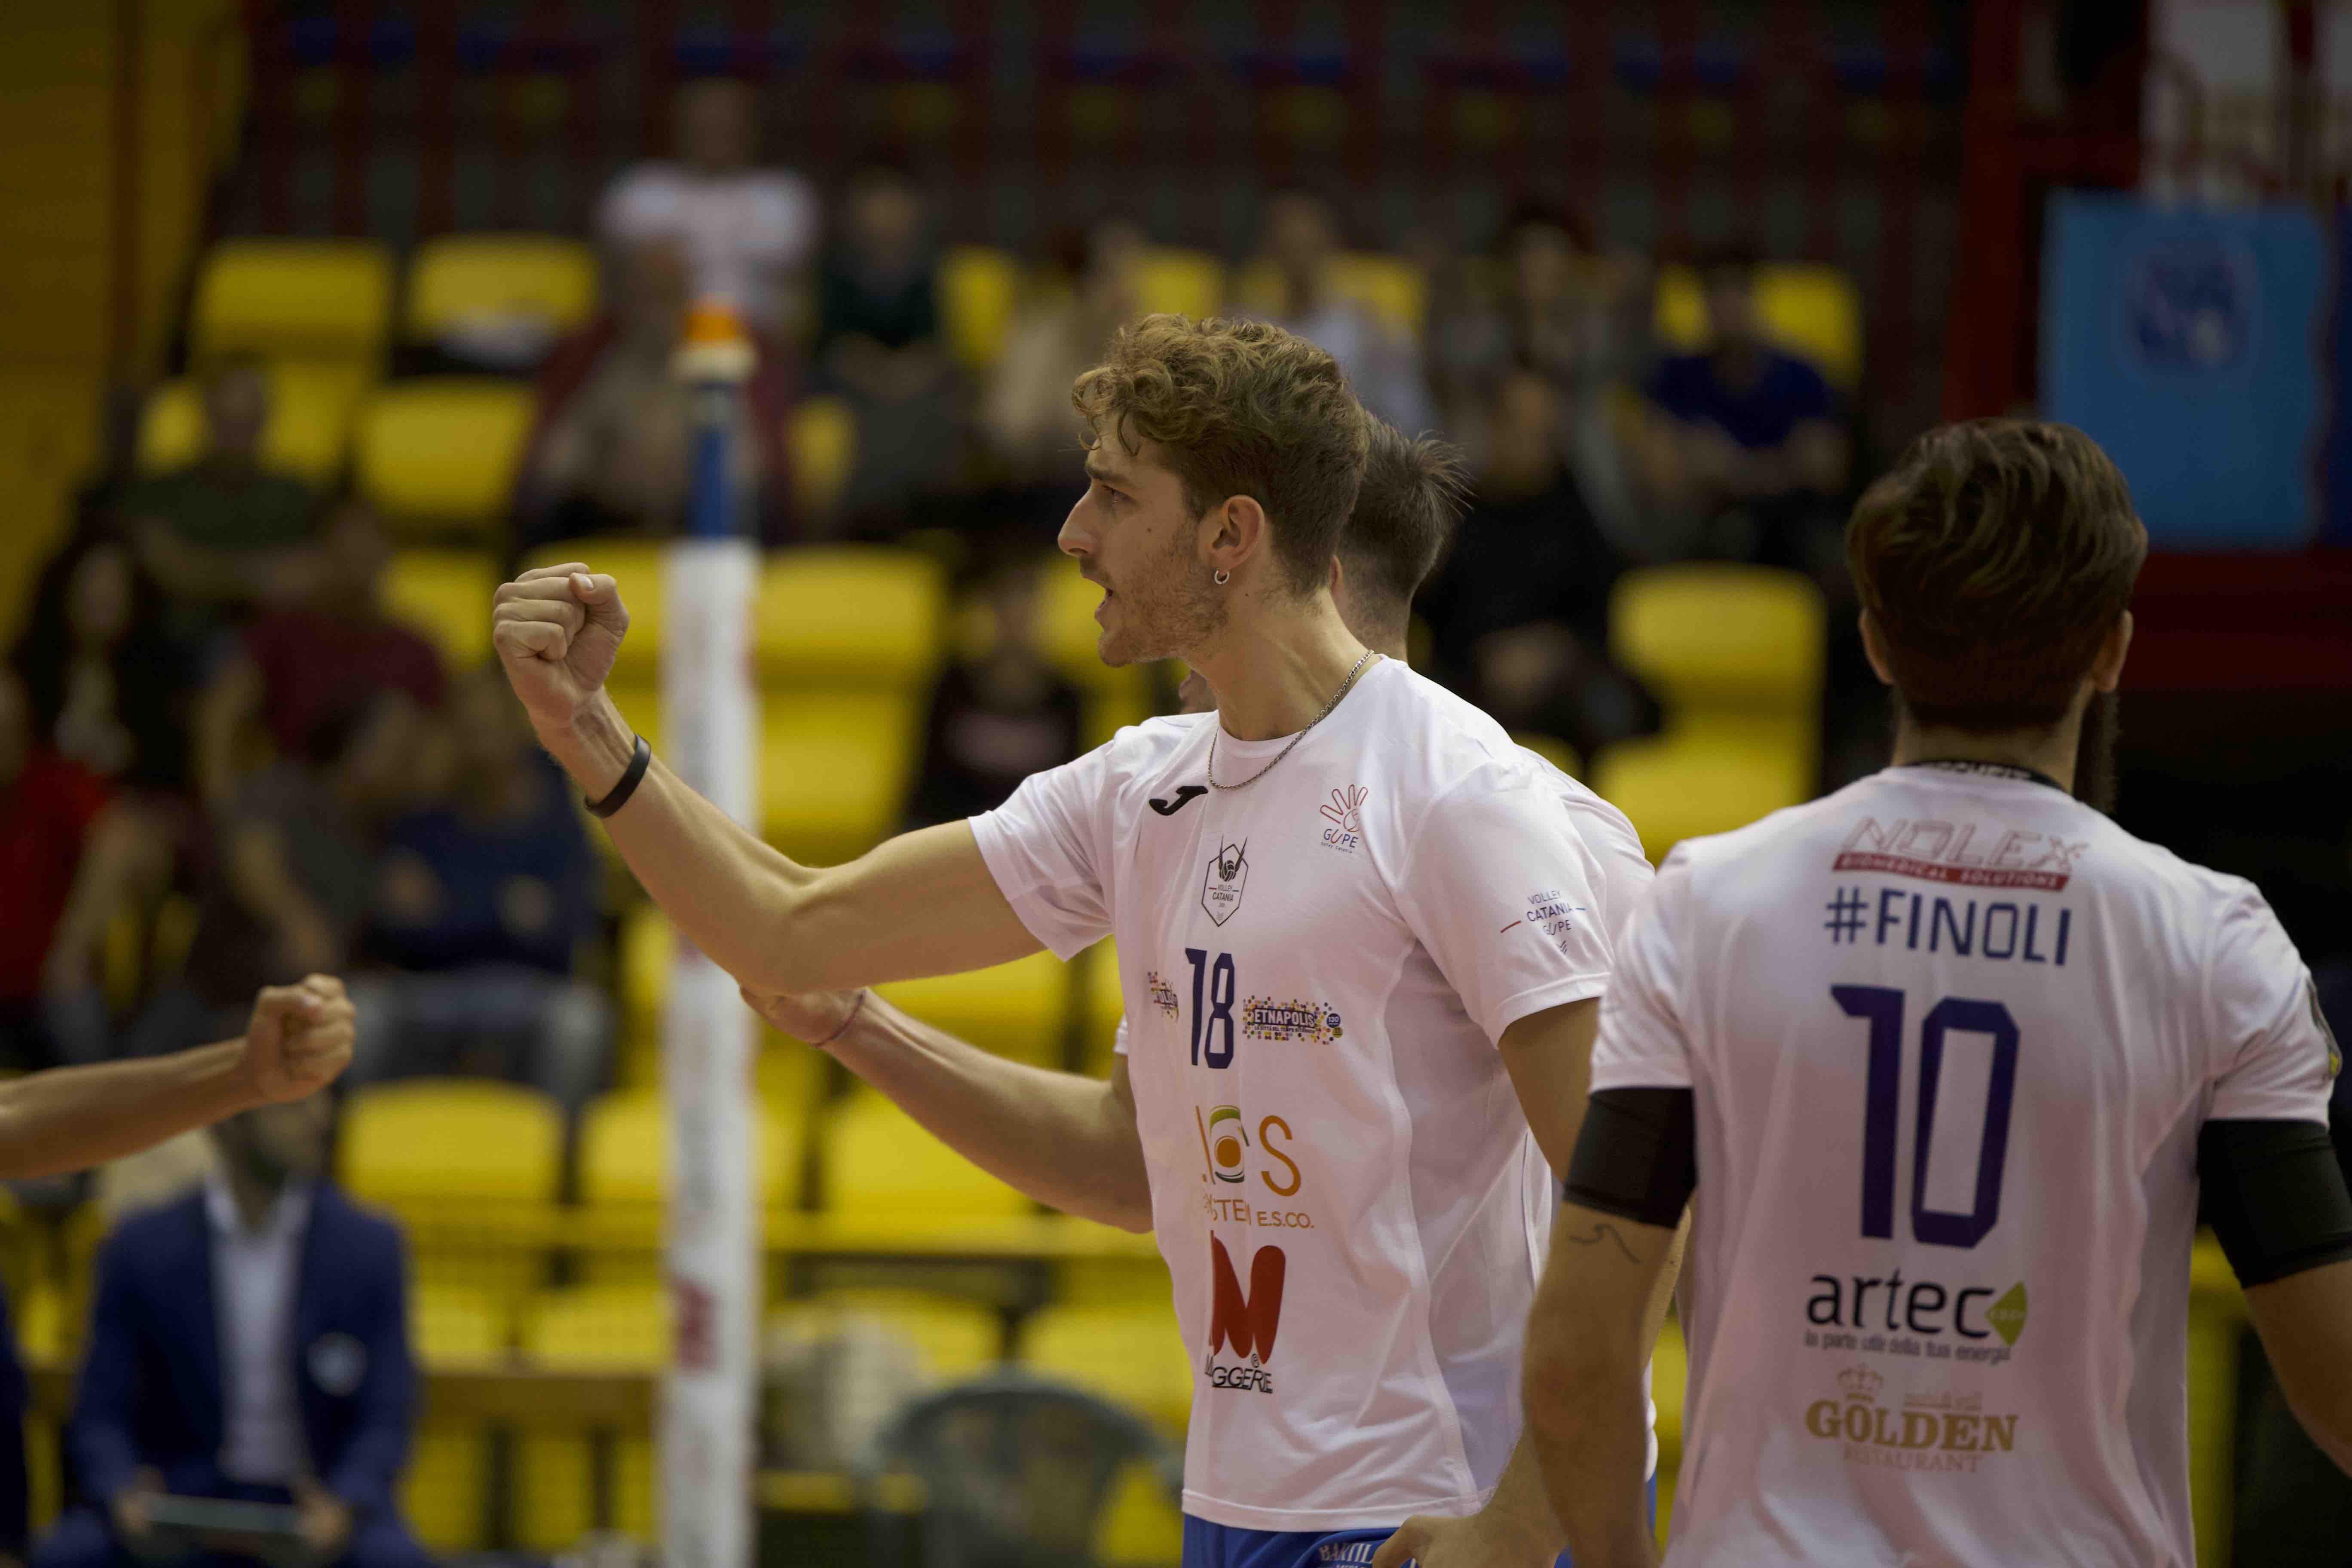 Volley Catania - Elios messaggerie Catania vs Sieco Service Ortona